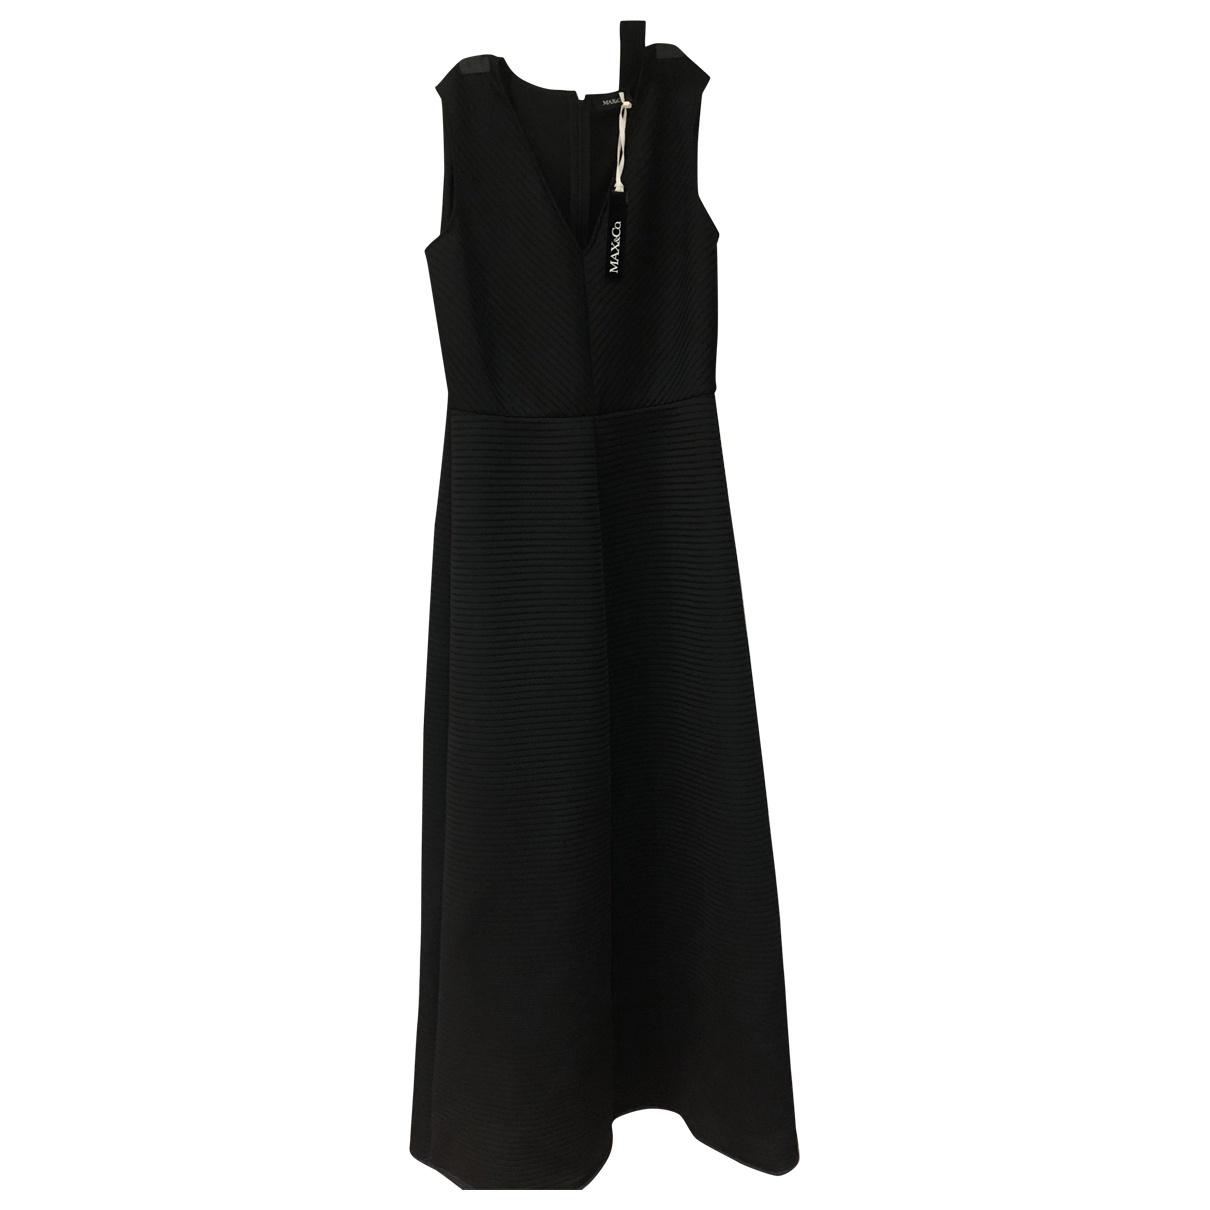 Max & Co \N Black dress for Women L International